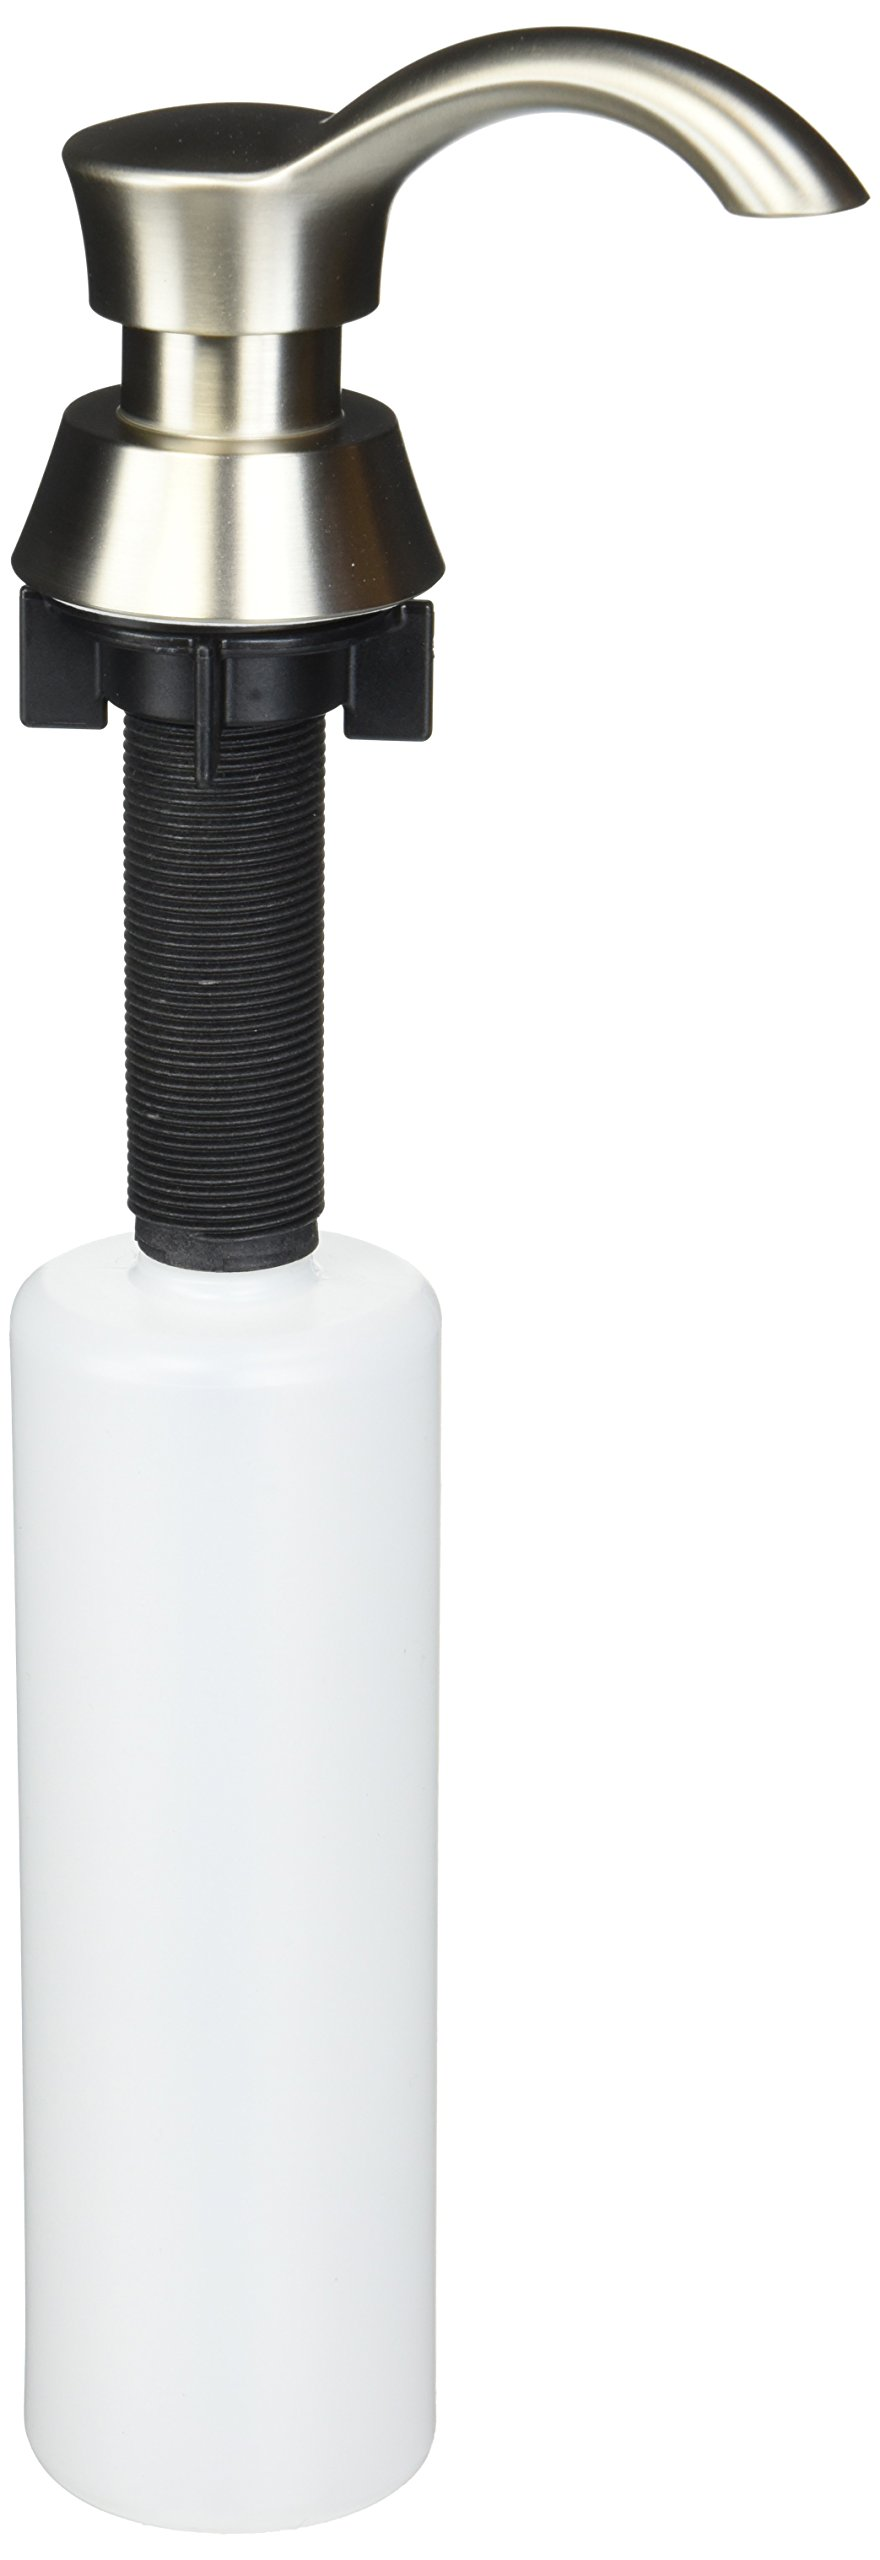 Delta Faucet RP50781SP Gala, Soap/Lotion Dispenser Spot Shield, Stainless